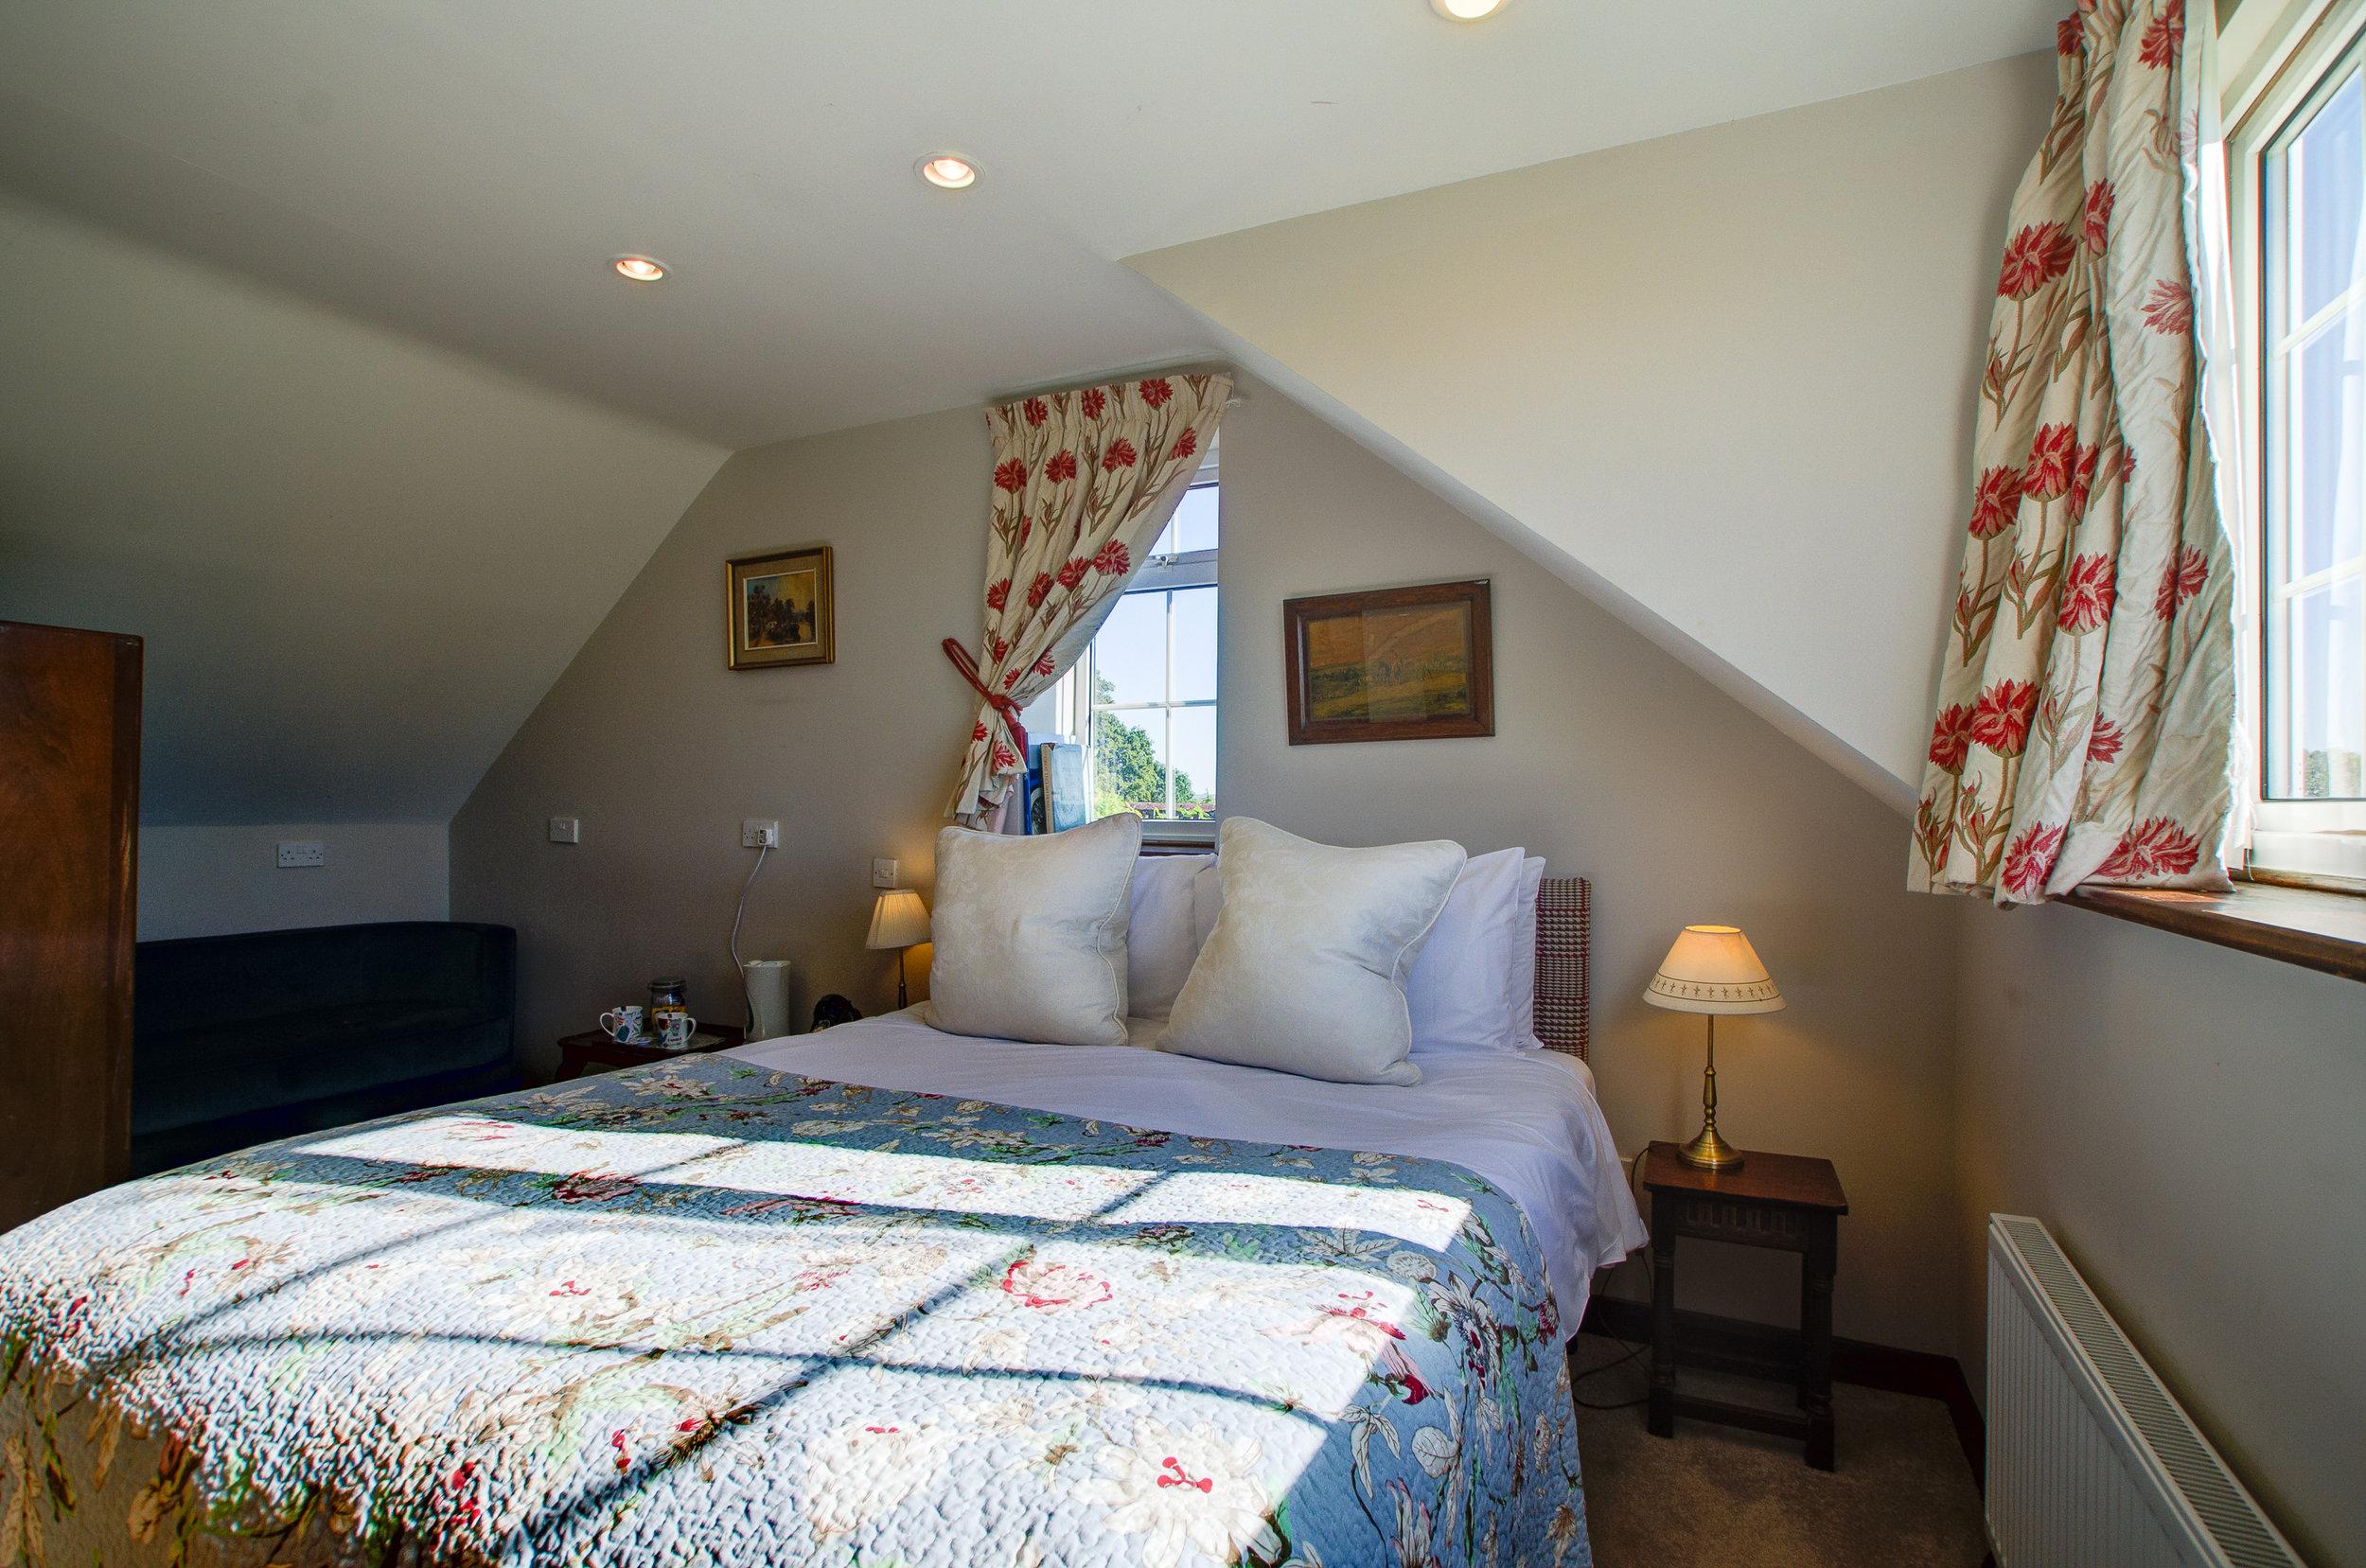 Copy of Cabin room